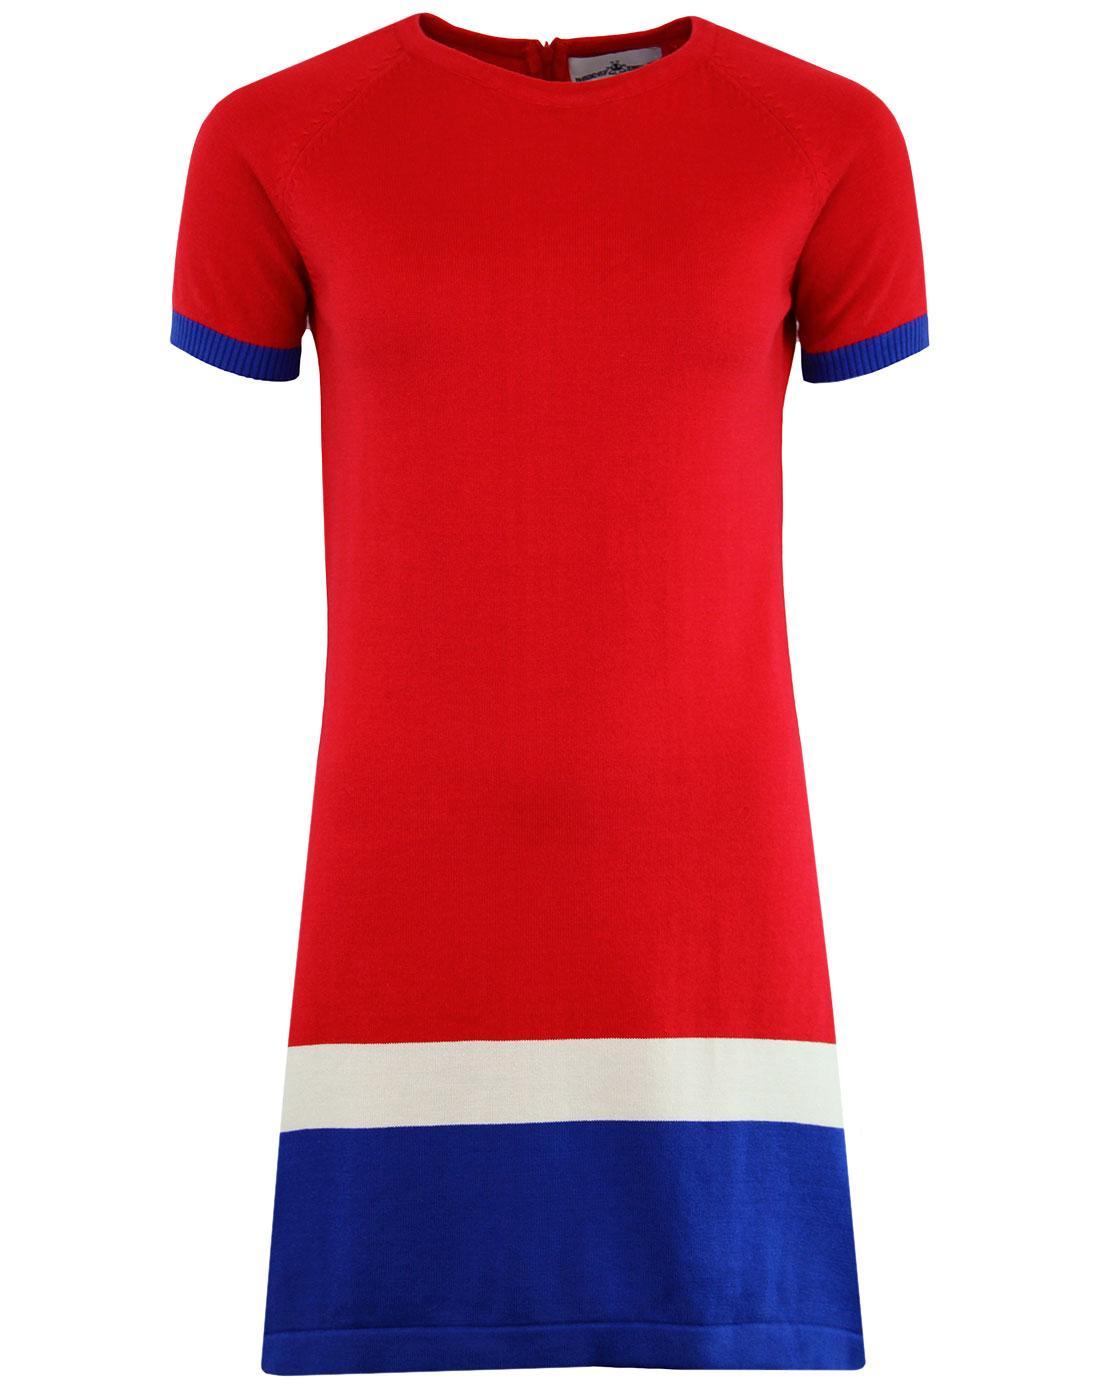 madcap england jenny retro mod knitted panel dress